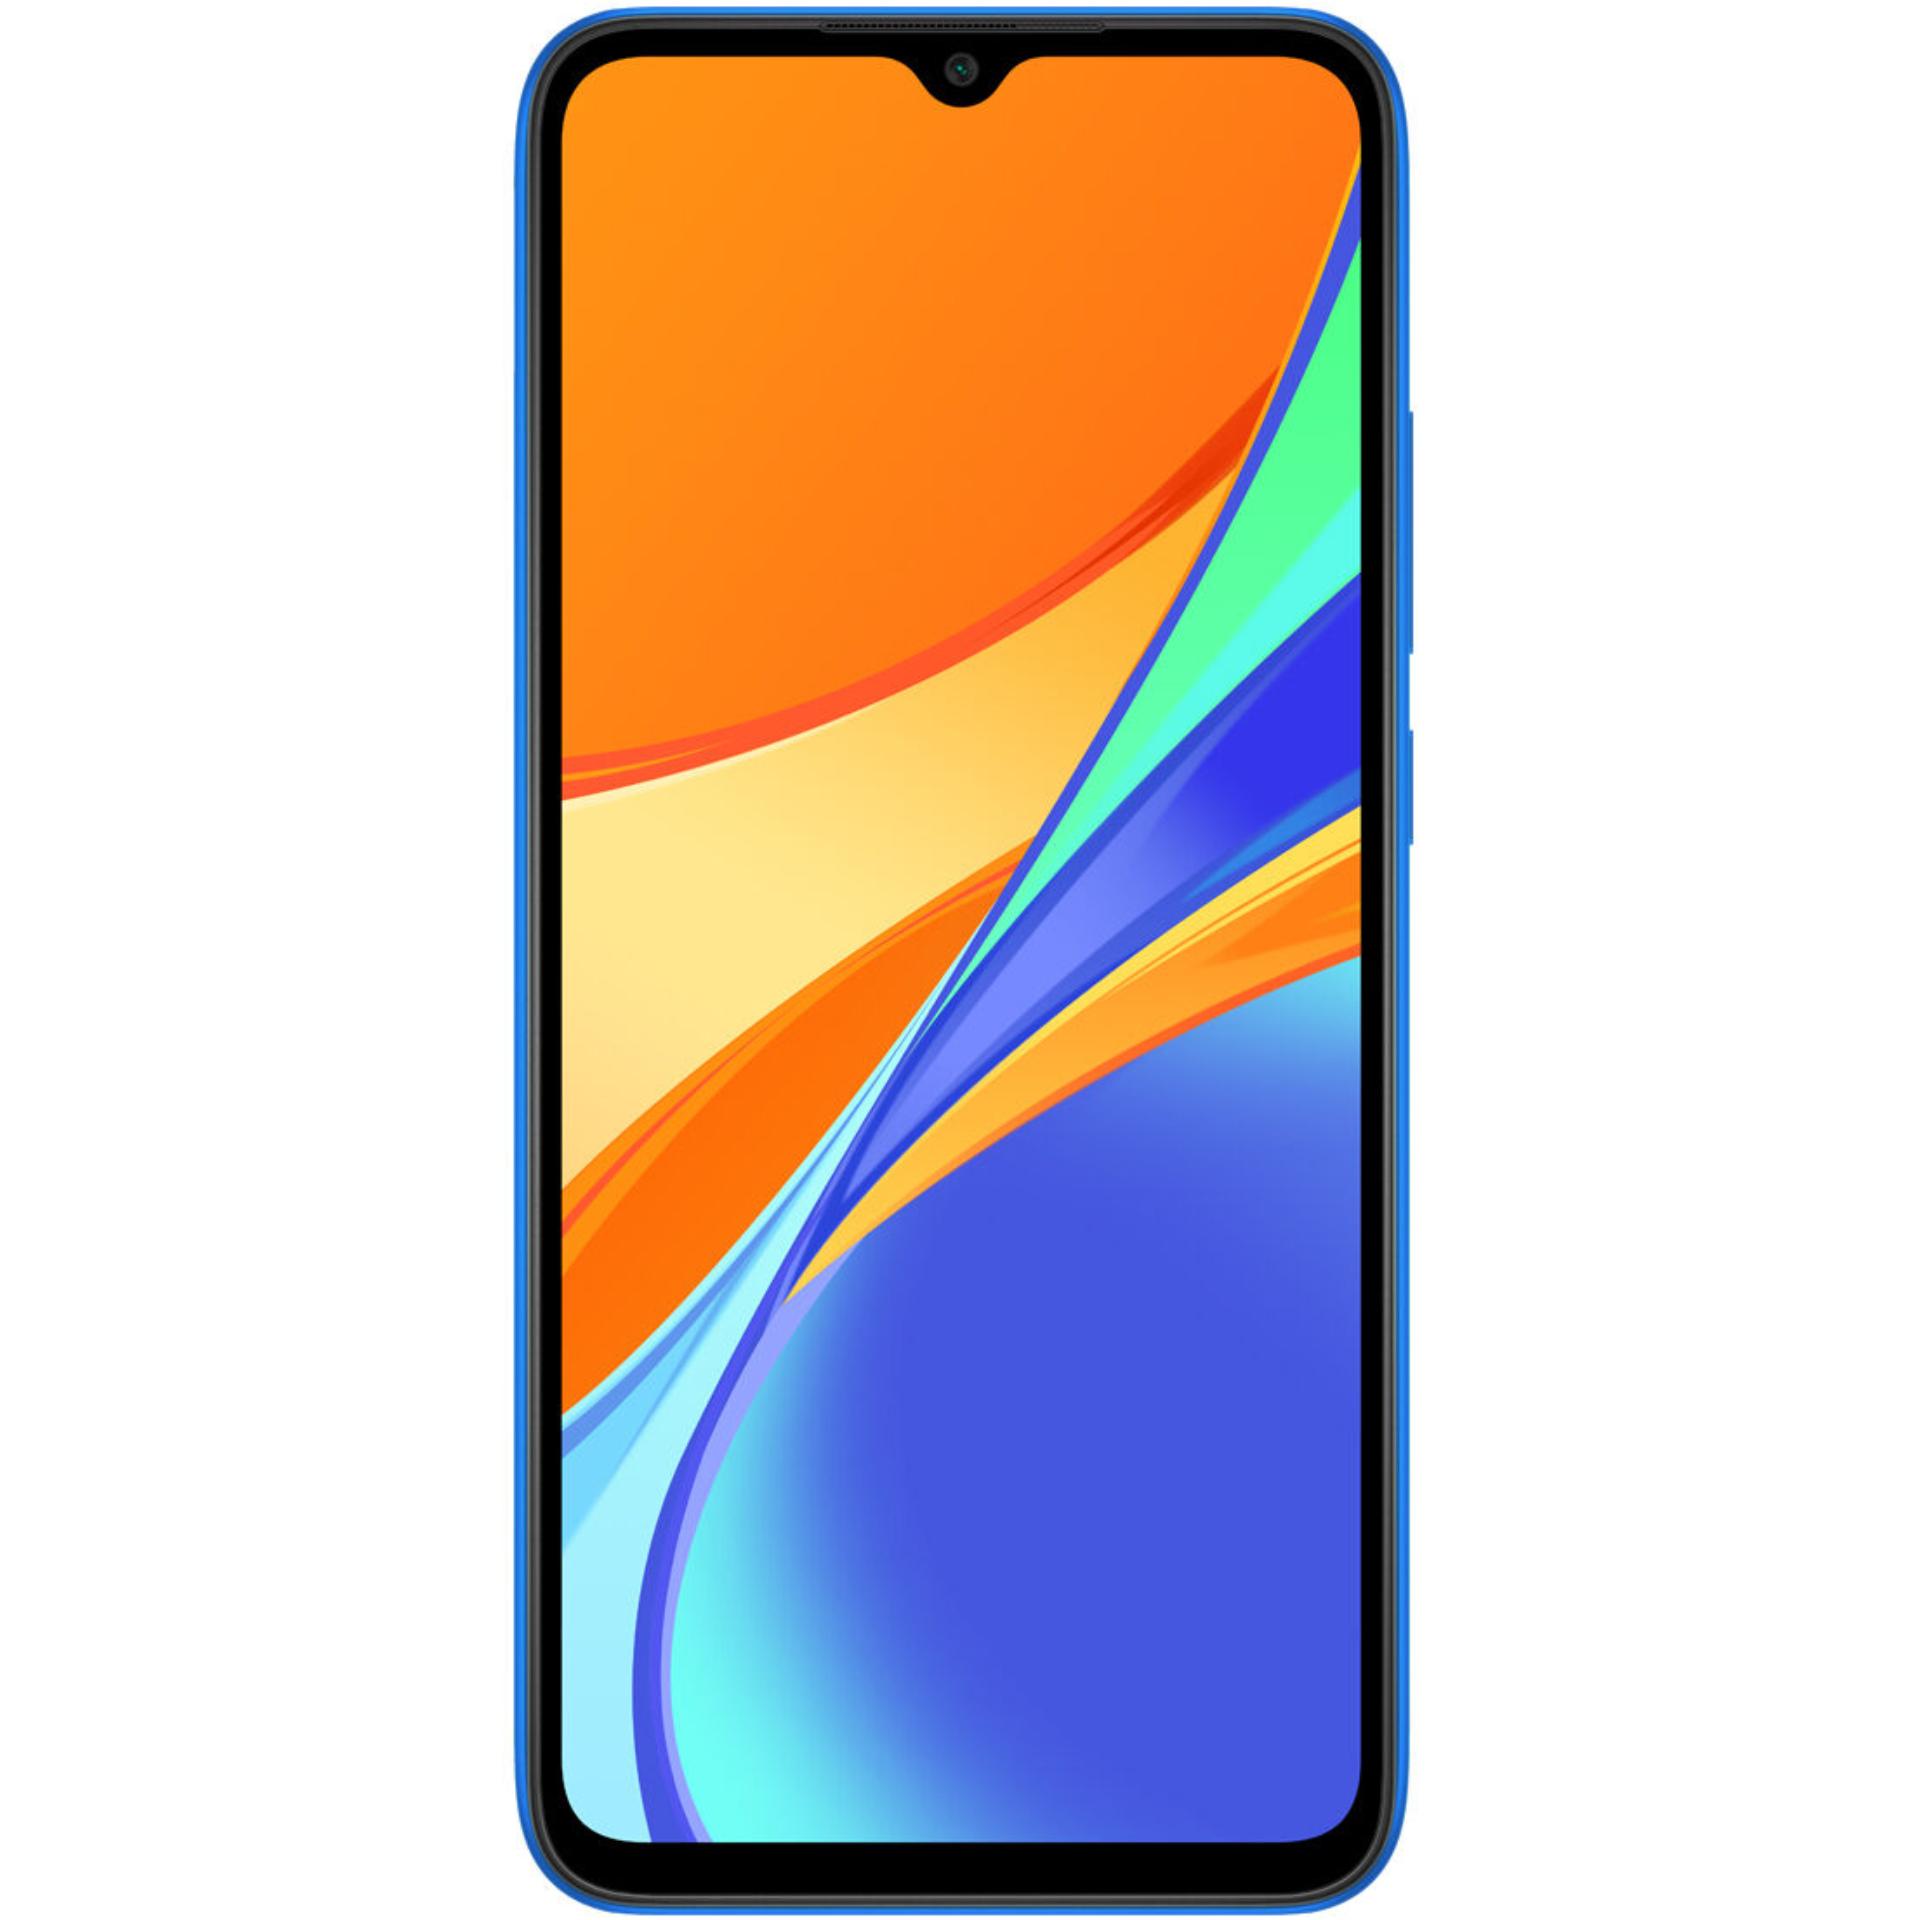 "Xiaomi Redmi 9C 64/3GB (Helio G35, 6.53"" HD Display, 5000mAh Akku, 13MP Triple Kamera, Klinke, Fingerabdruck, MicroSD Slot, 196 Gramm)"